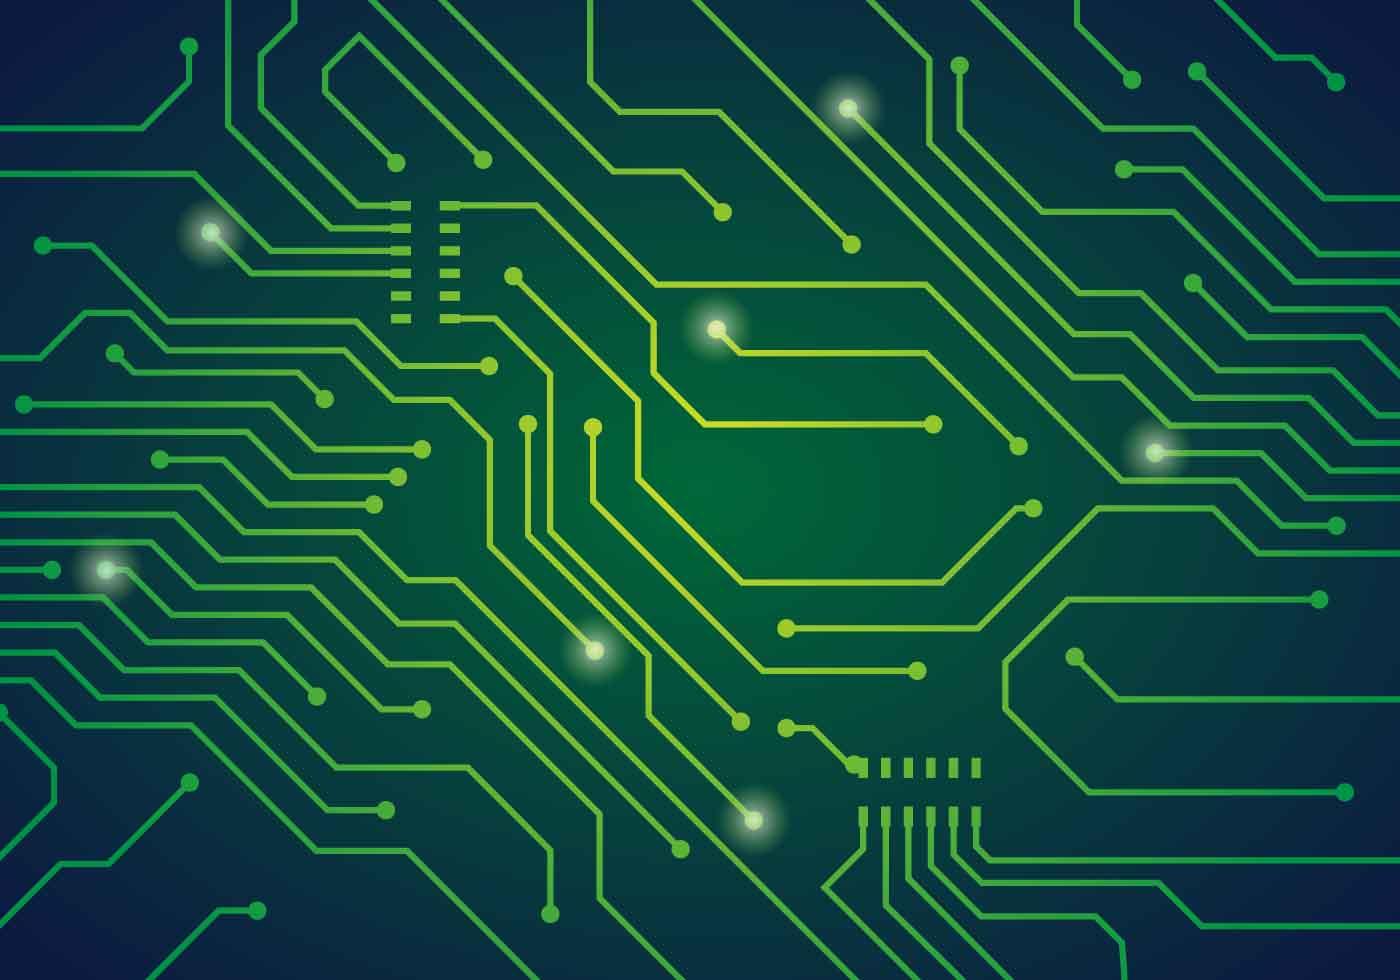 Printed Circuit Board Vector Illustration Download Free